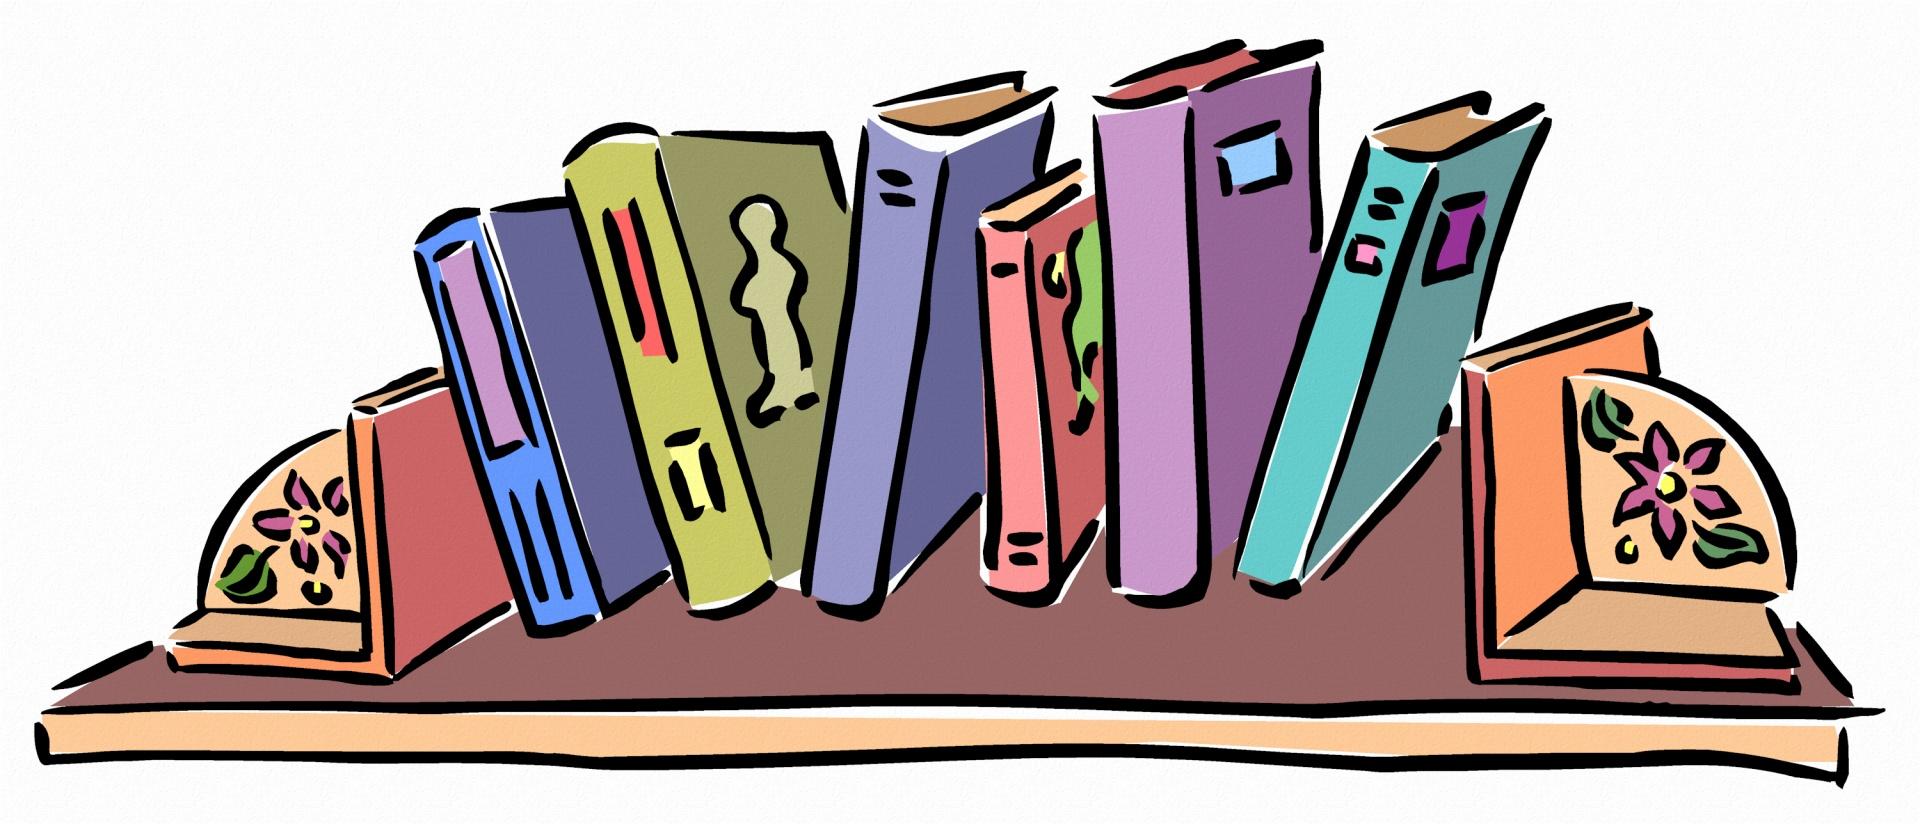 Boekenplank Met Boeken.Boekenplank Met Boeken 1461525030fni Friends Of The Troy Public